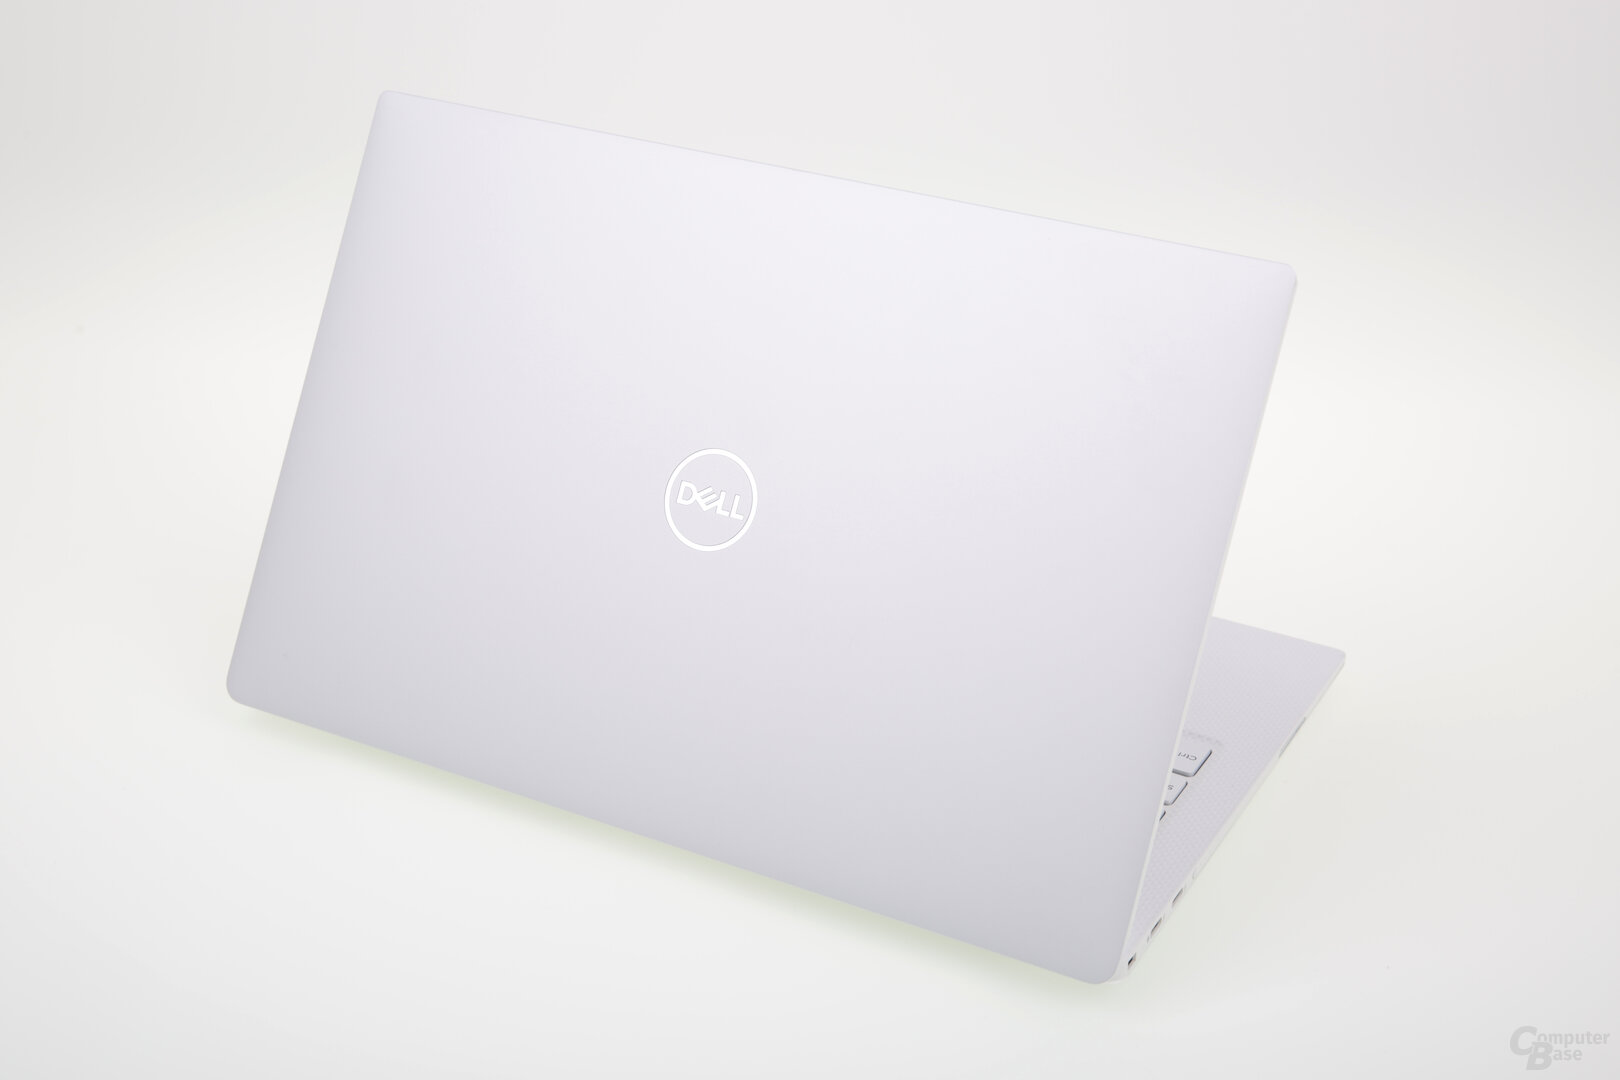 Dell XPS 13 (9380) mit silbernem Gehäuse